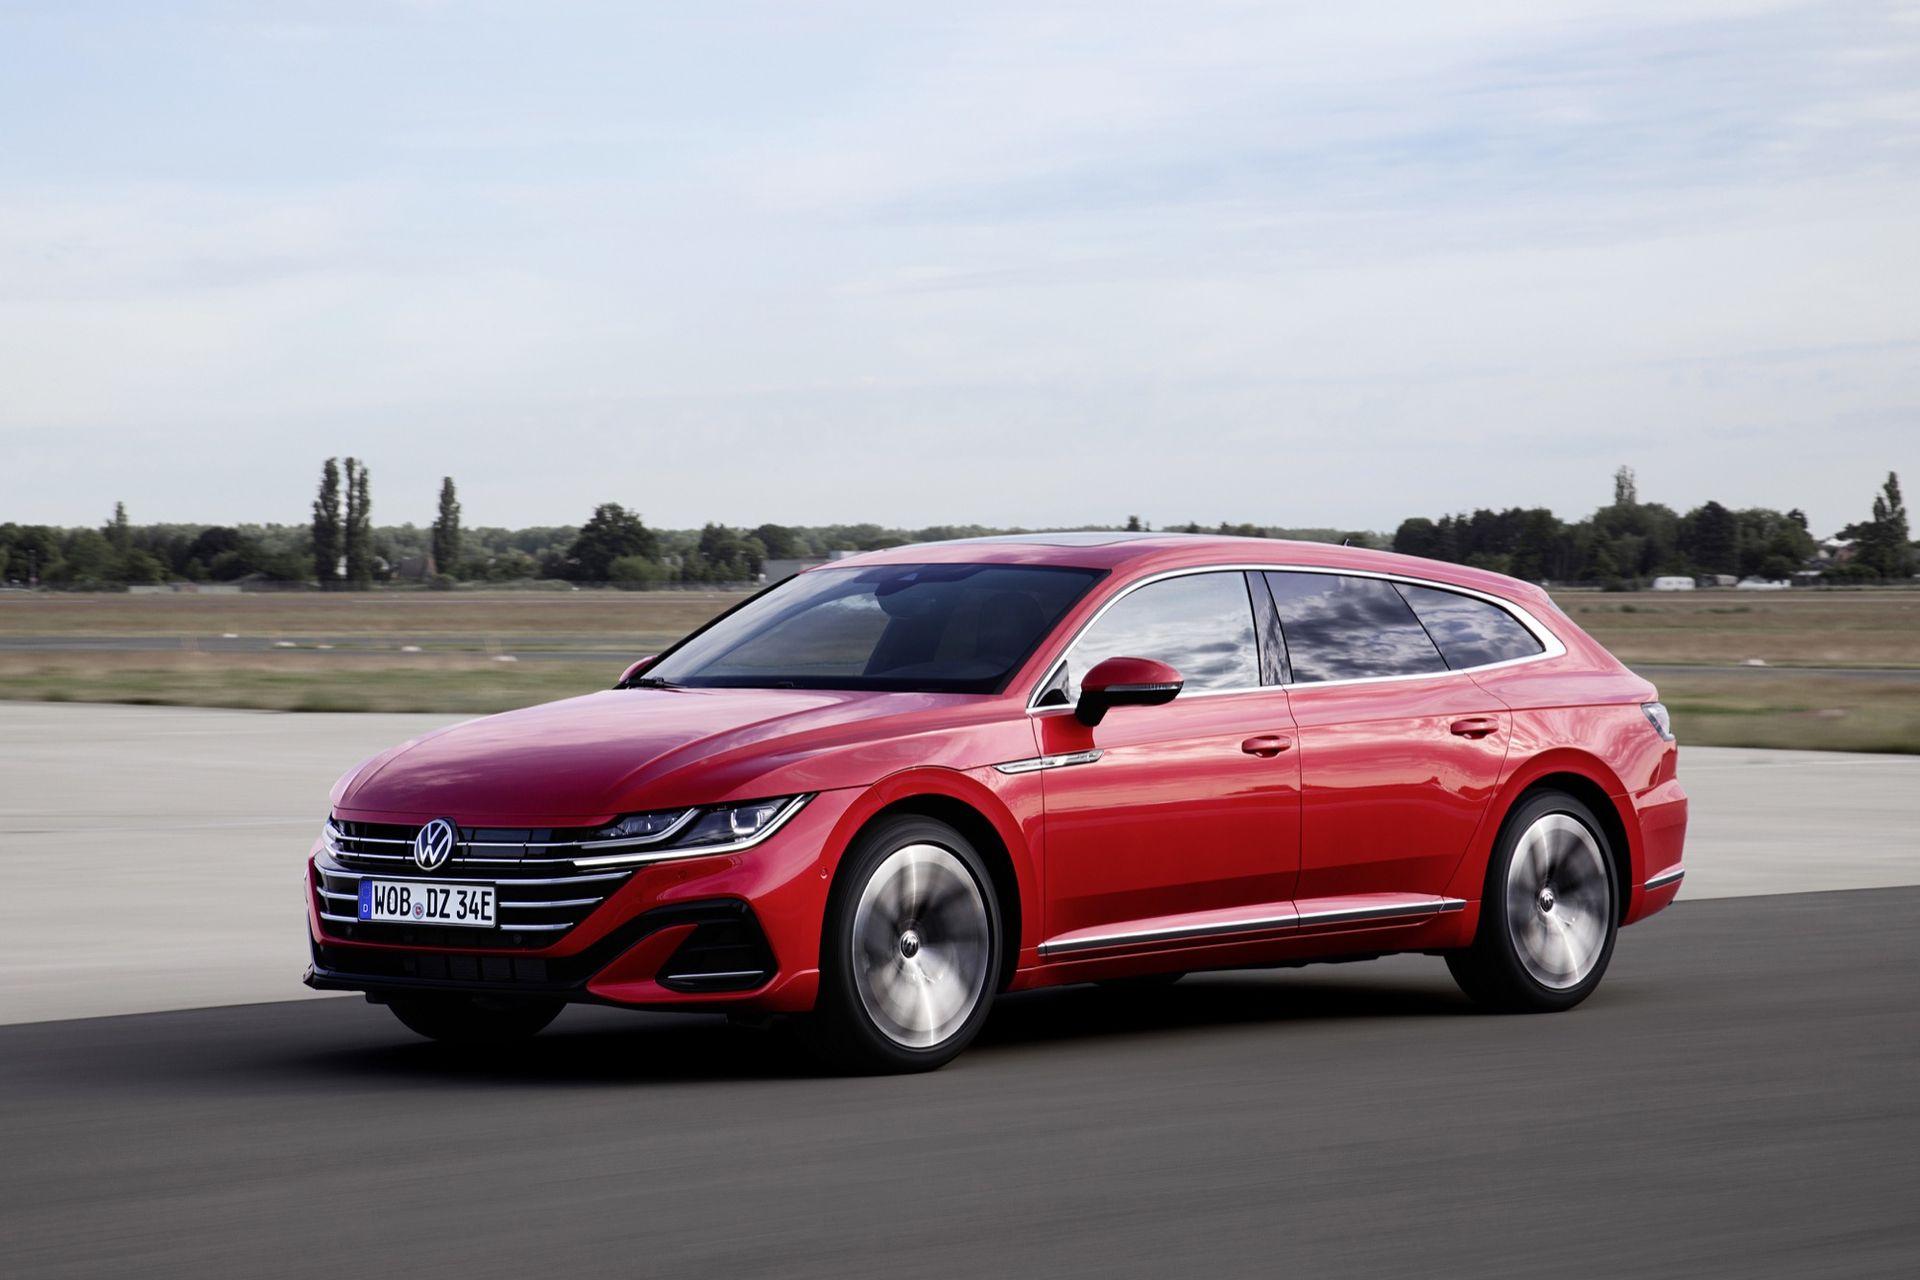 Nu börjar Volkswagen sälja nya Arteon som laddhybrid